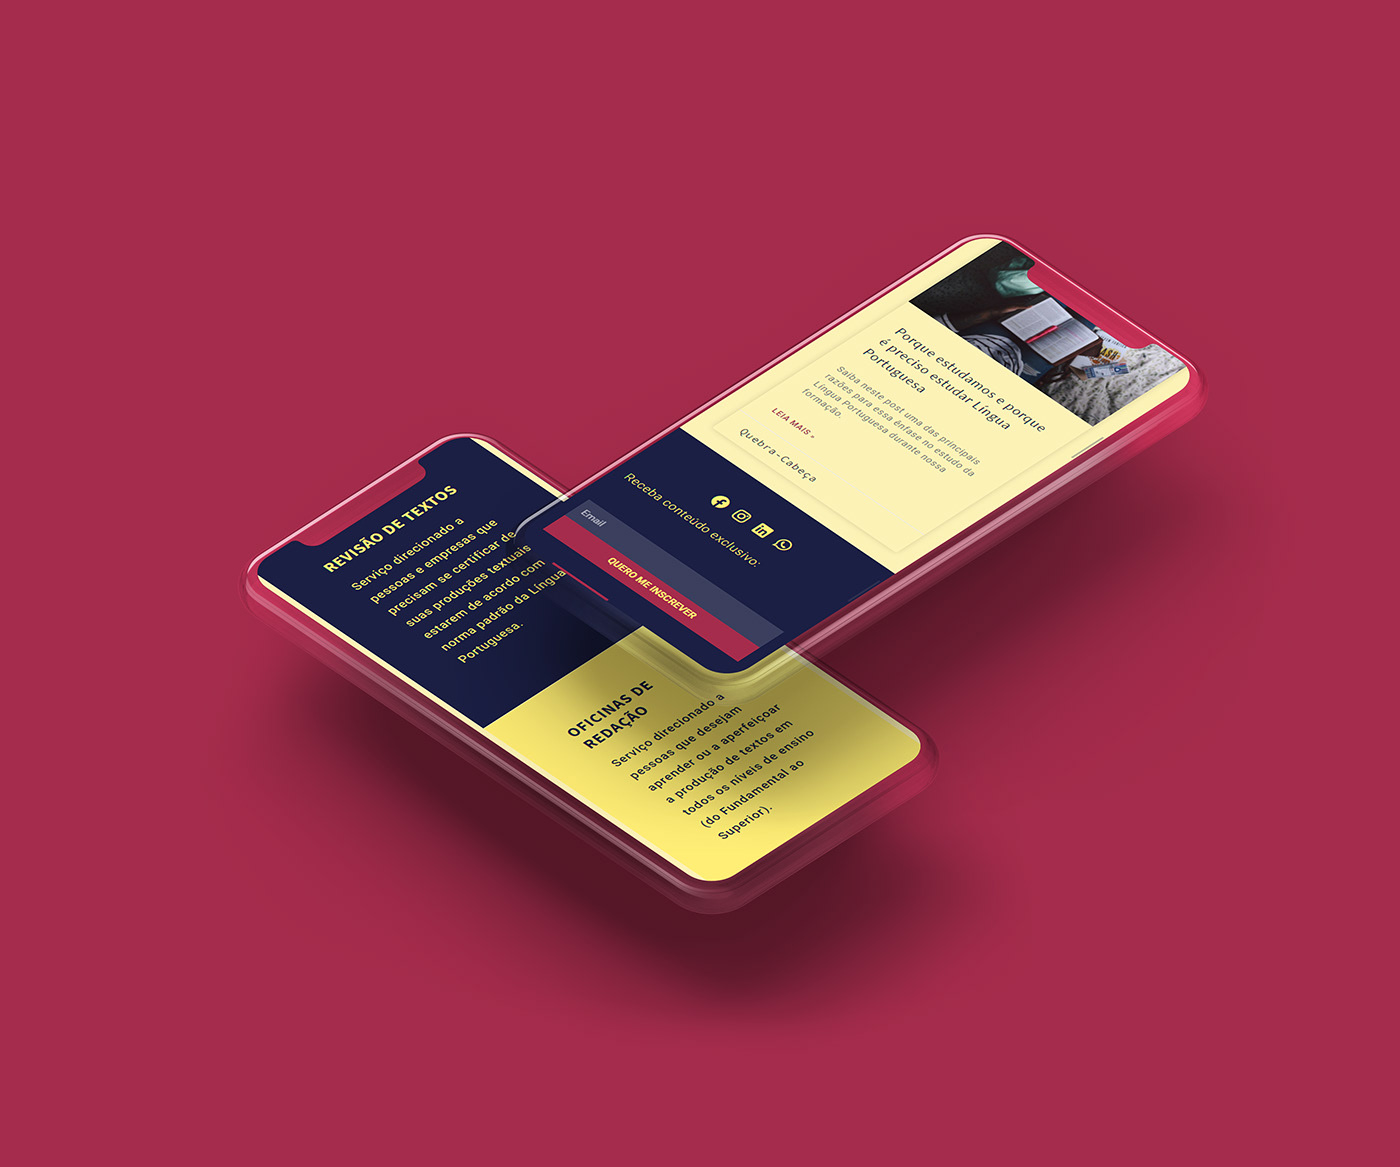 Brand Design Design de Marca identidade visual site visual identity Webdesign Website